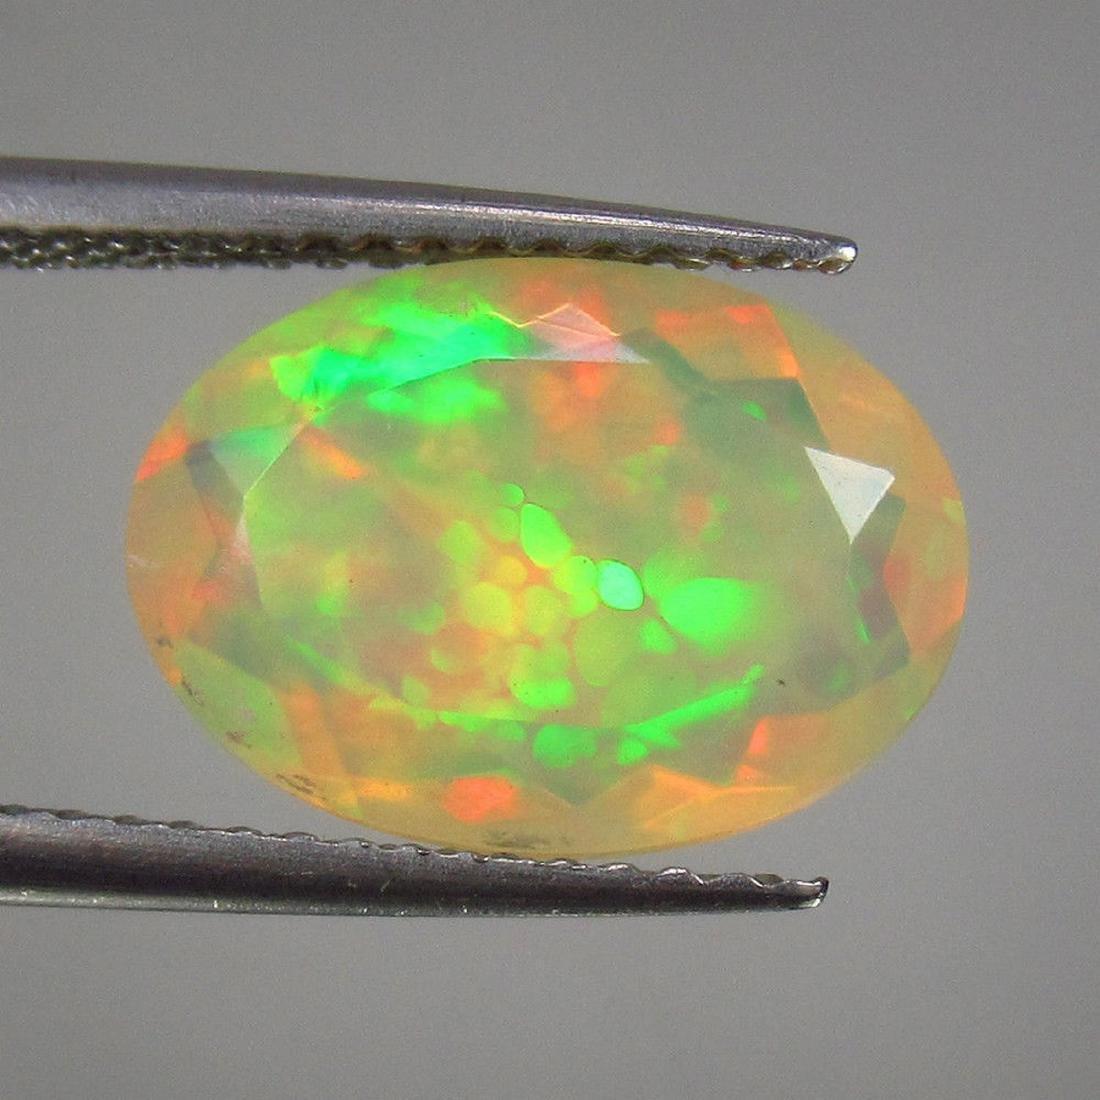 2.28 Carat Natural Loose Ethiopian Faceted Welo Opal